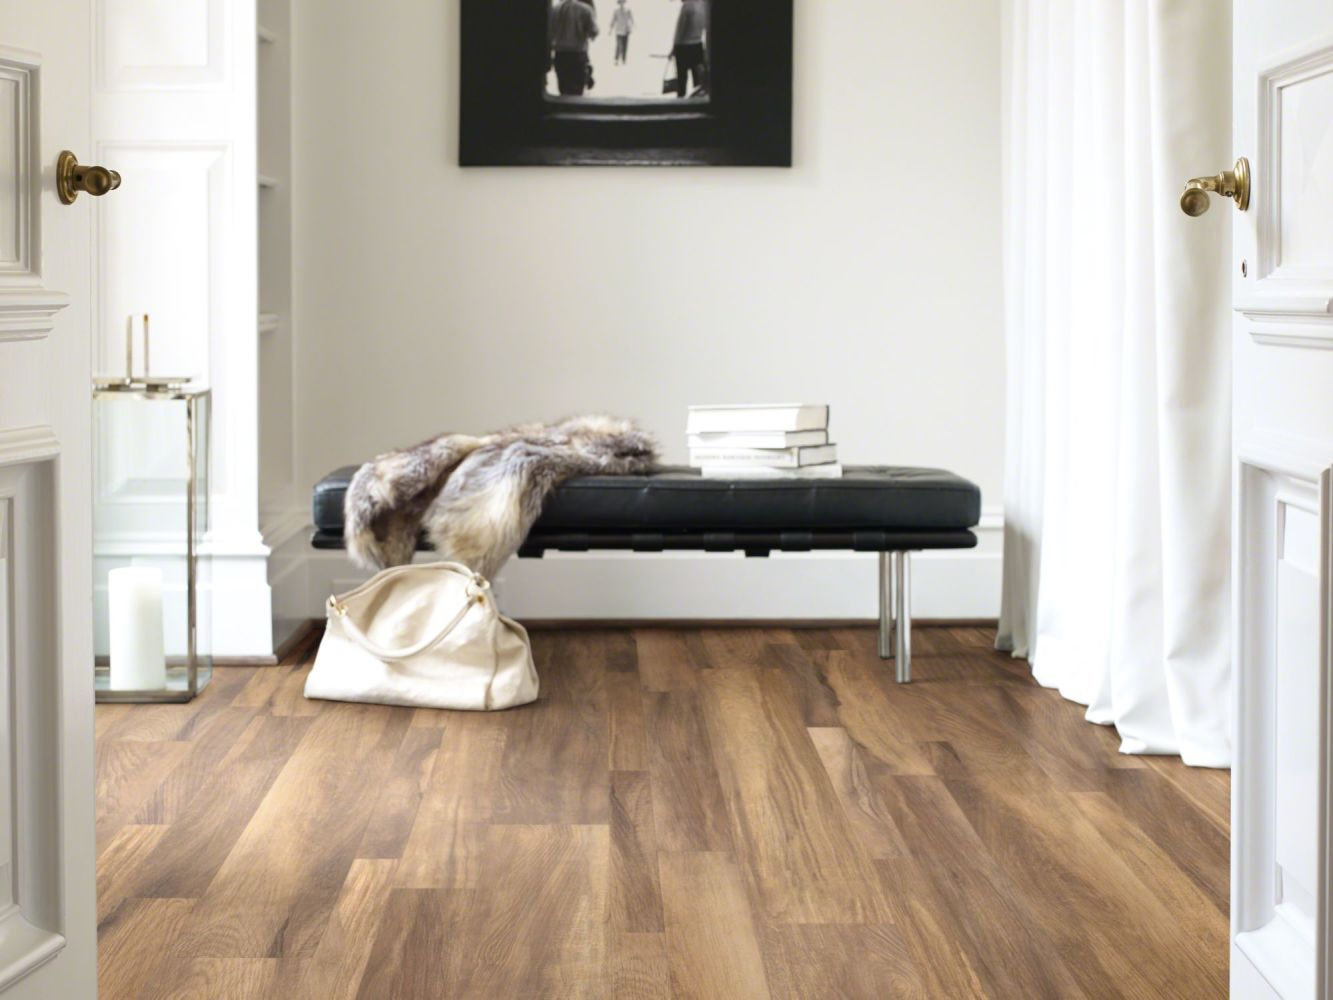 Shaw Floors SFA Largo Mix Plus Gran Sasso Jatoba 00608_501SA